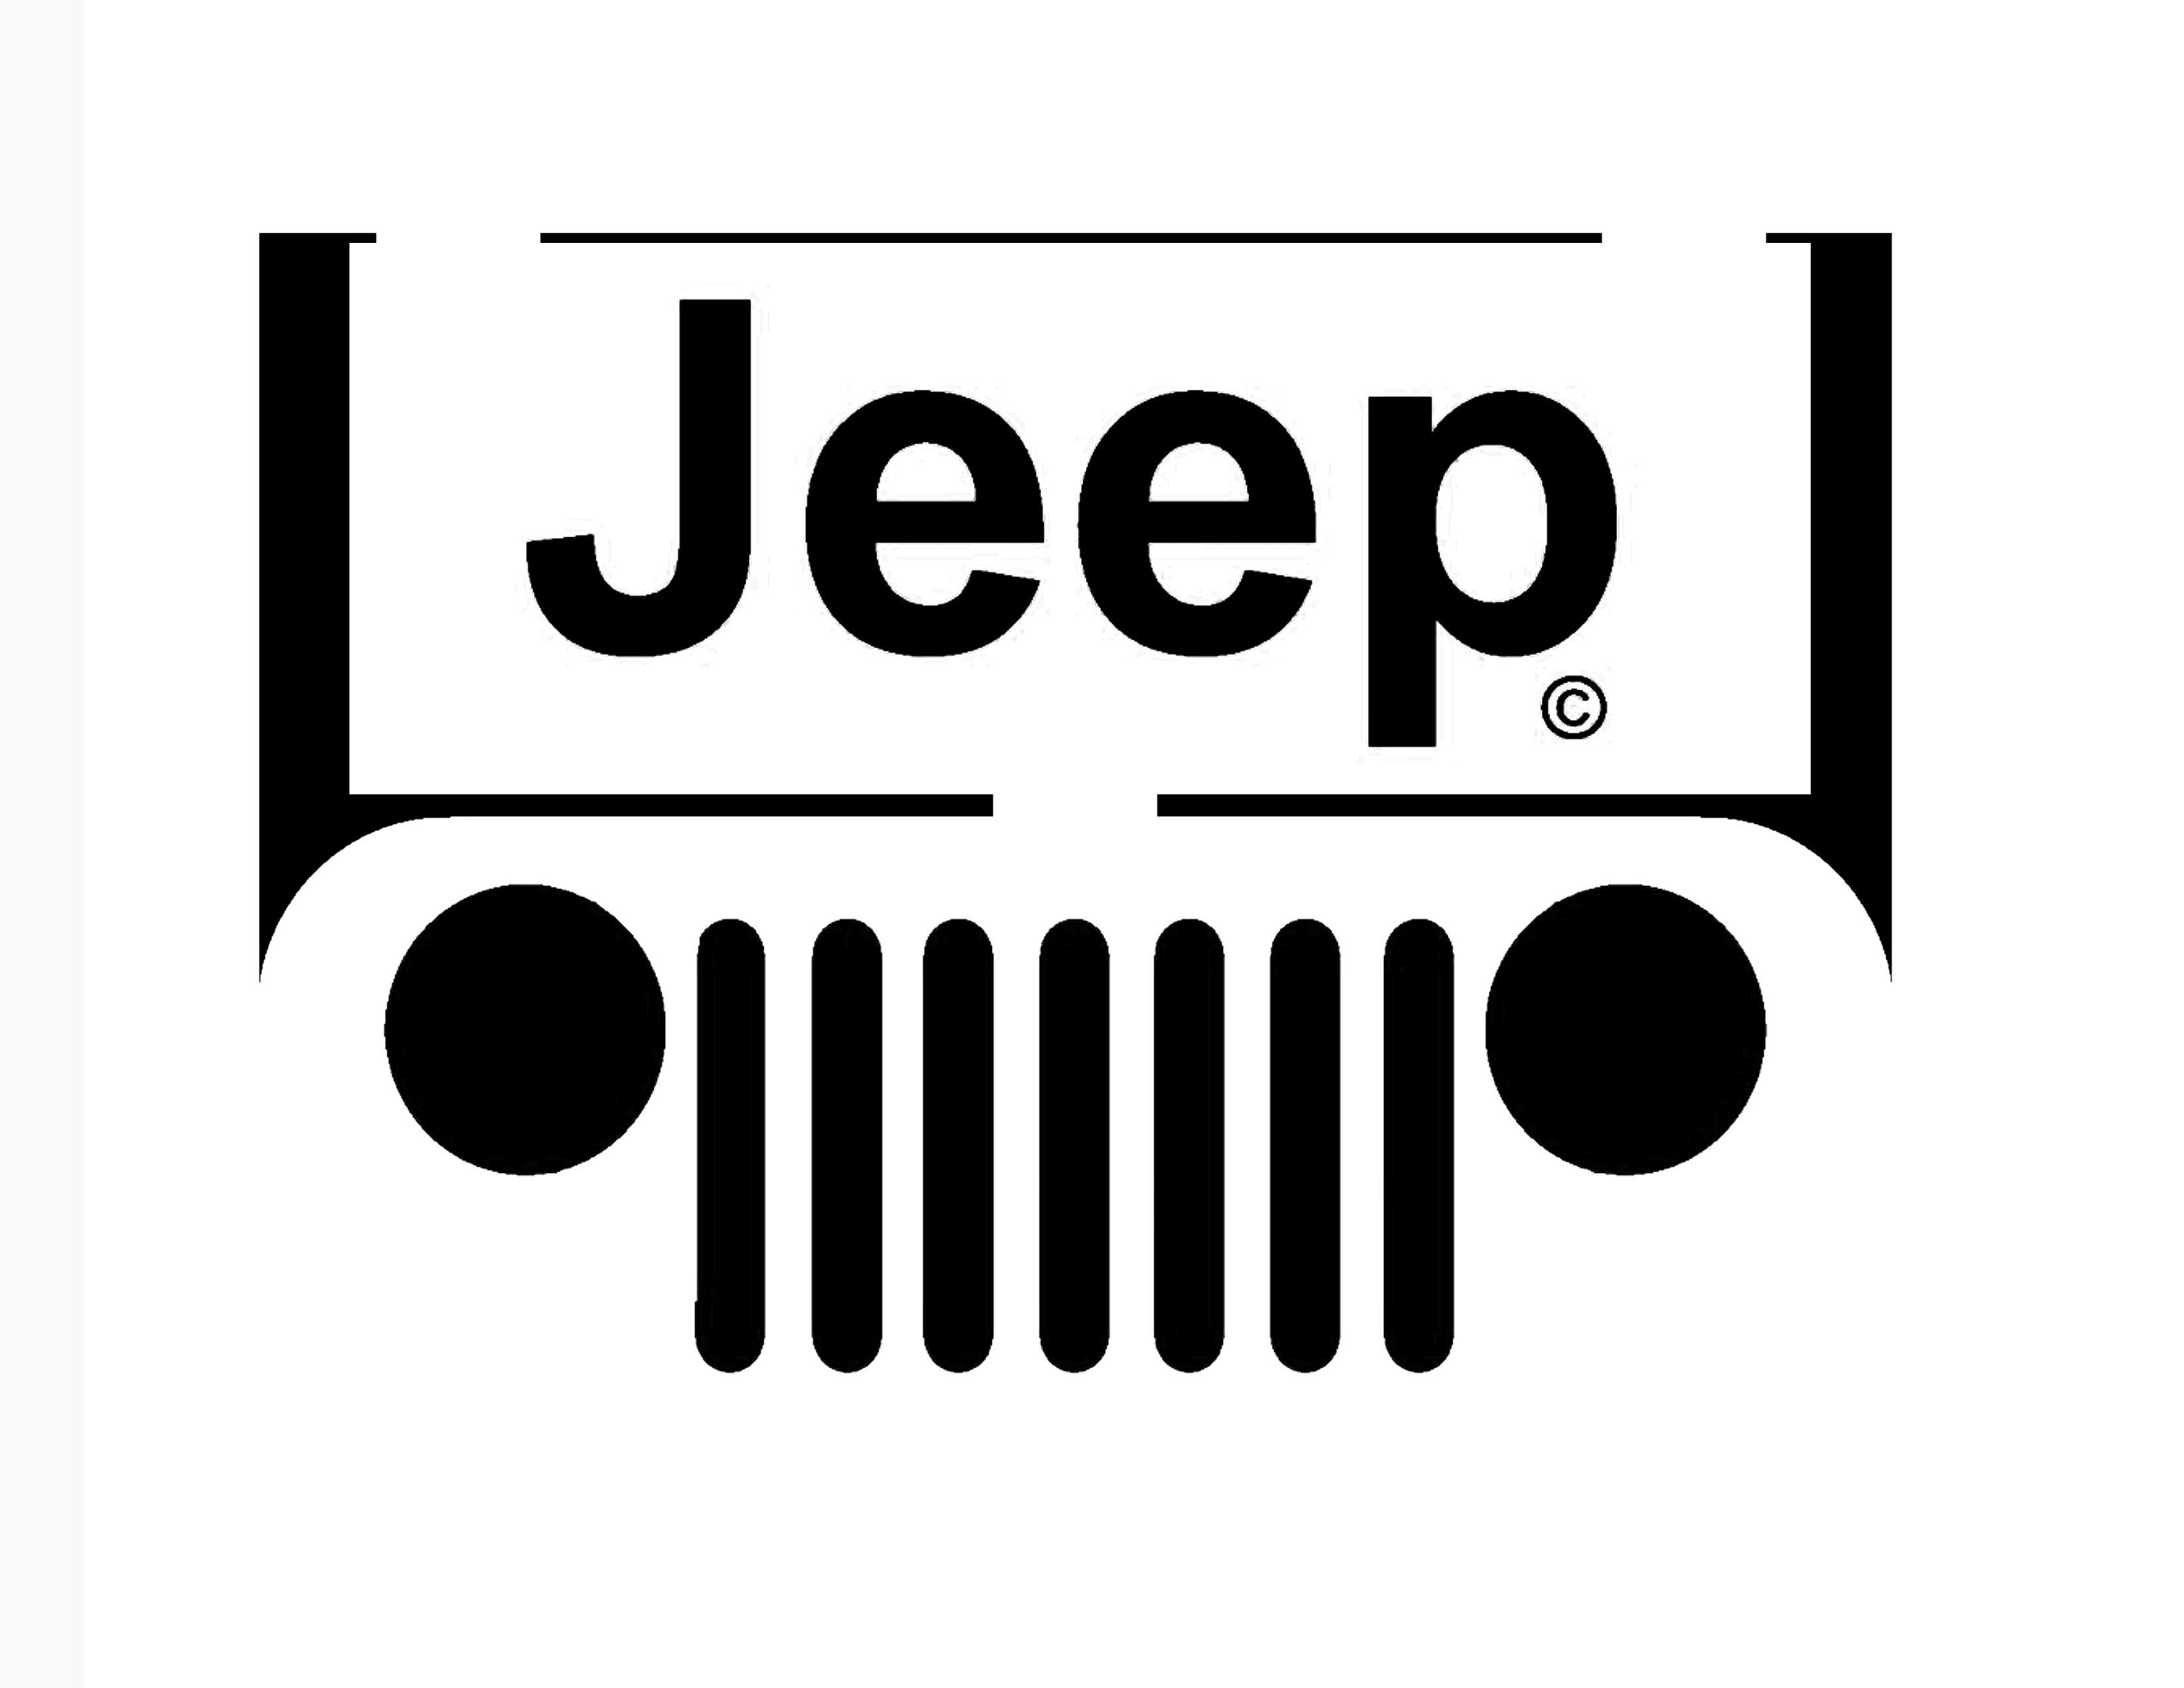 Jackolantern stencils truck and. Jeep clipart pumpkin carving